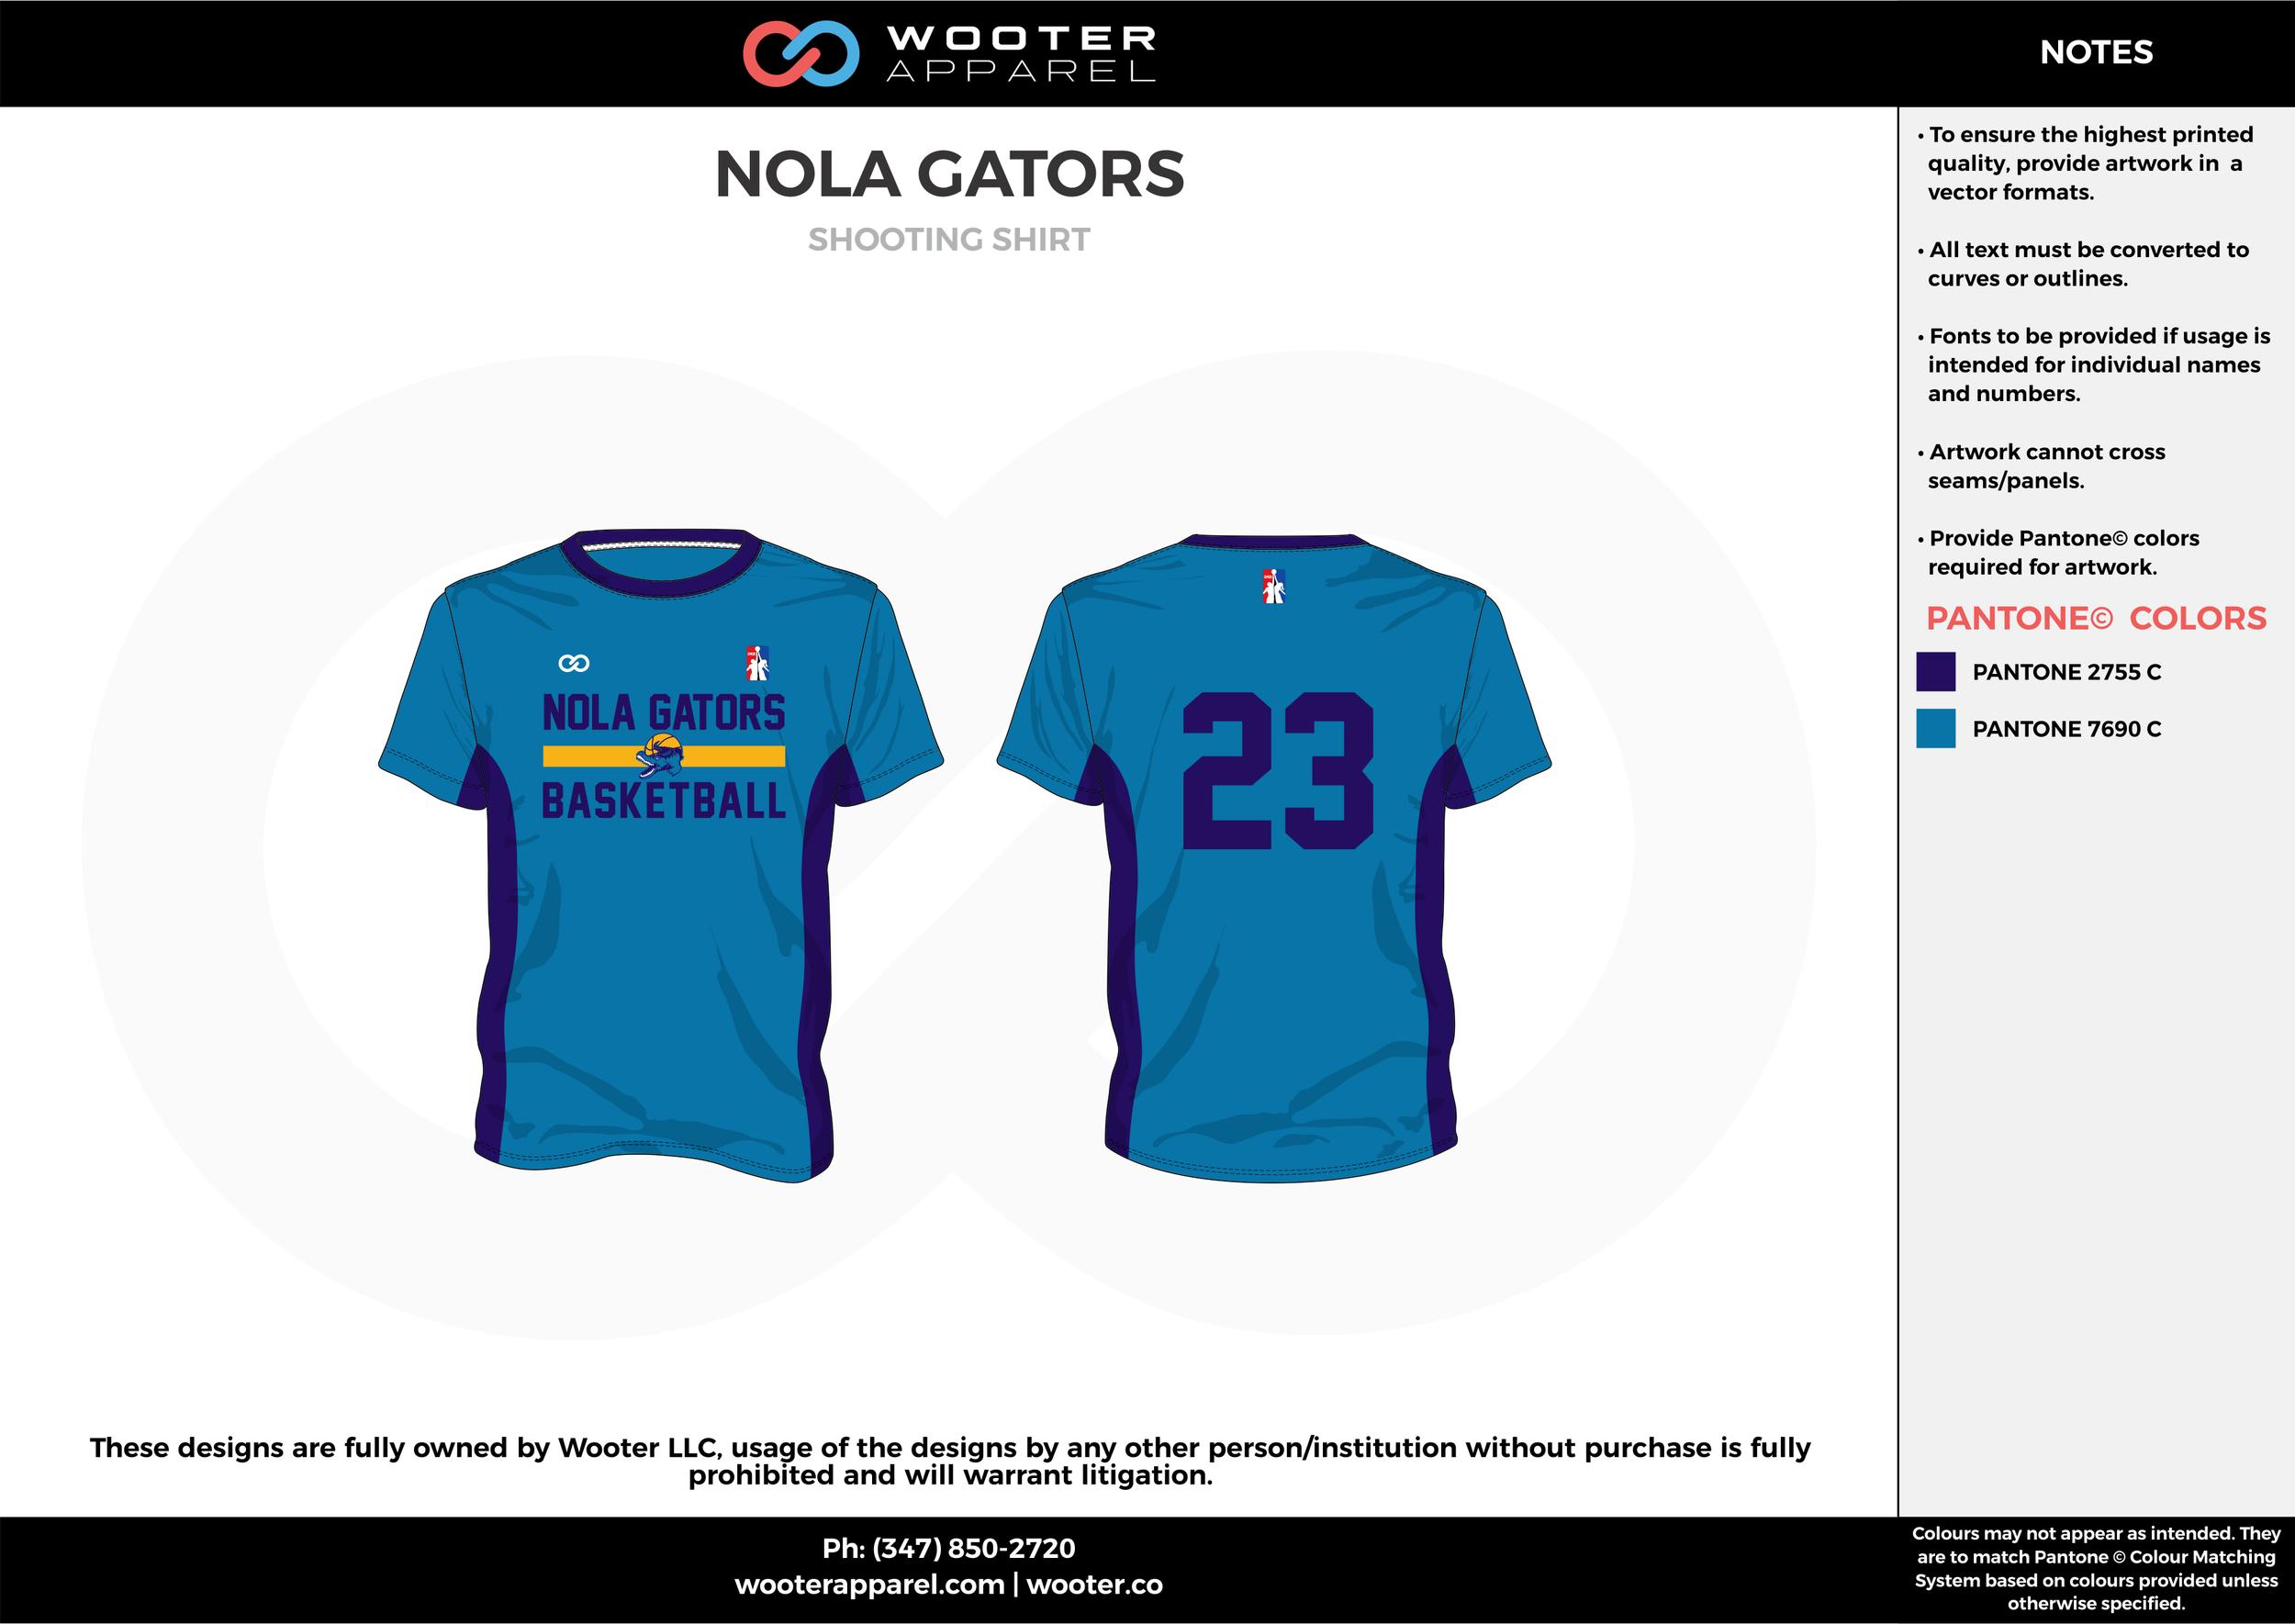 NOLA GATORS dark/sky blue Basketball Short Sleeve Shooting Shirt